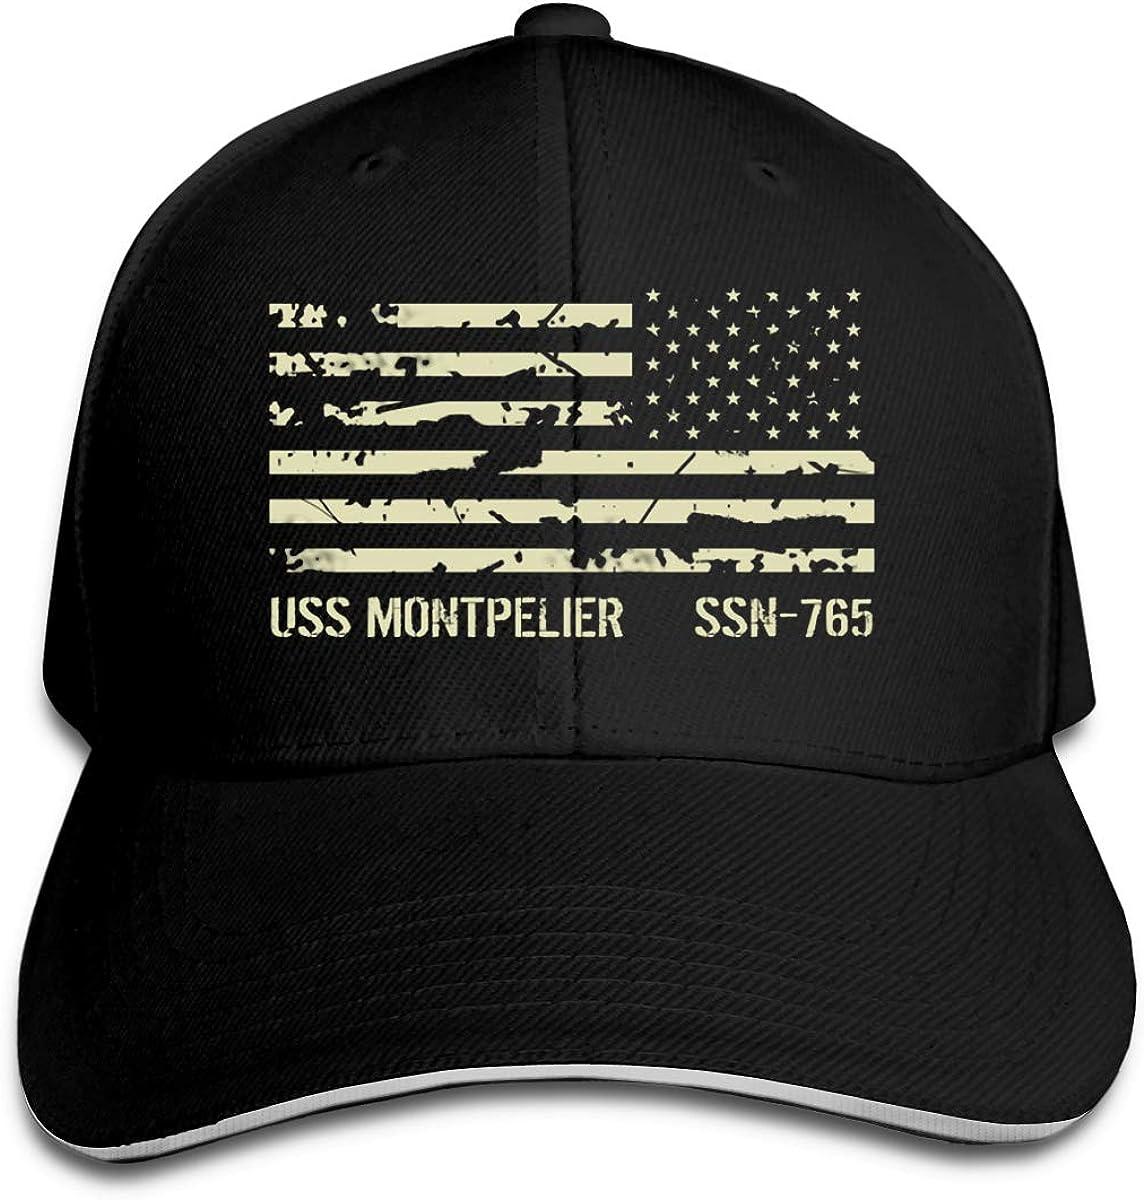 USS Montpelier SSN-765 Unisex Adult Baseball Caps Adjustable Sandwich Caps Jeans Caps Adjustable Denim Trucker Cap